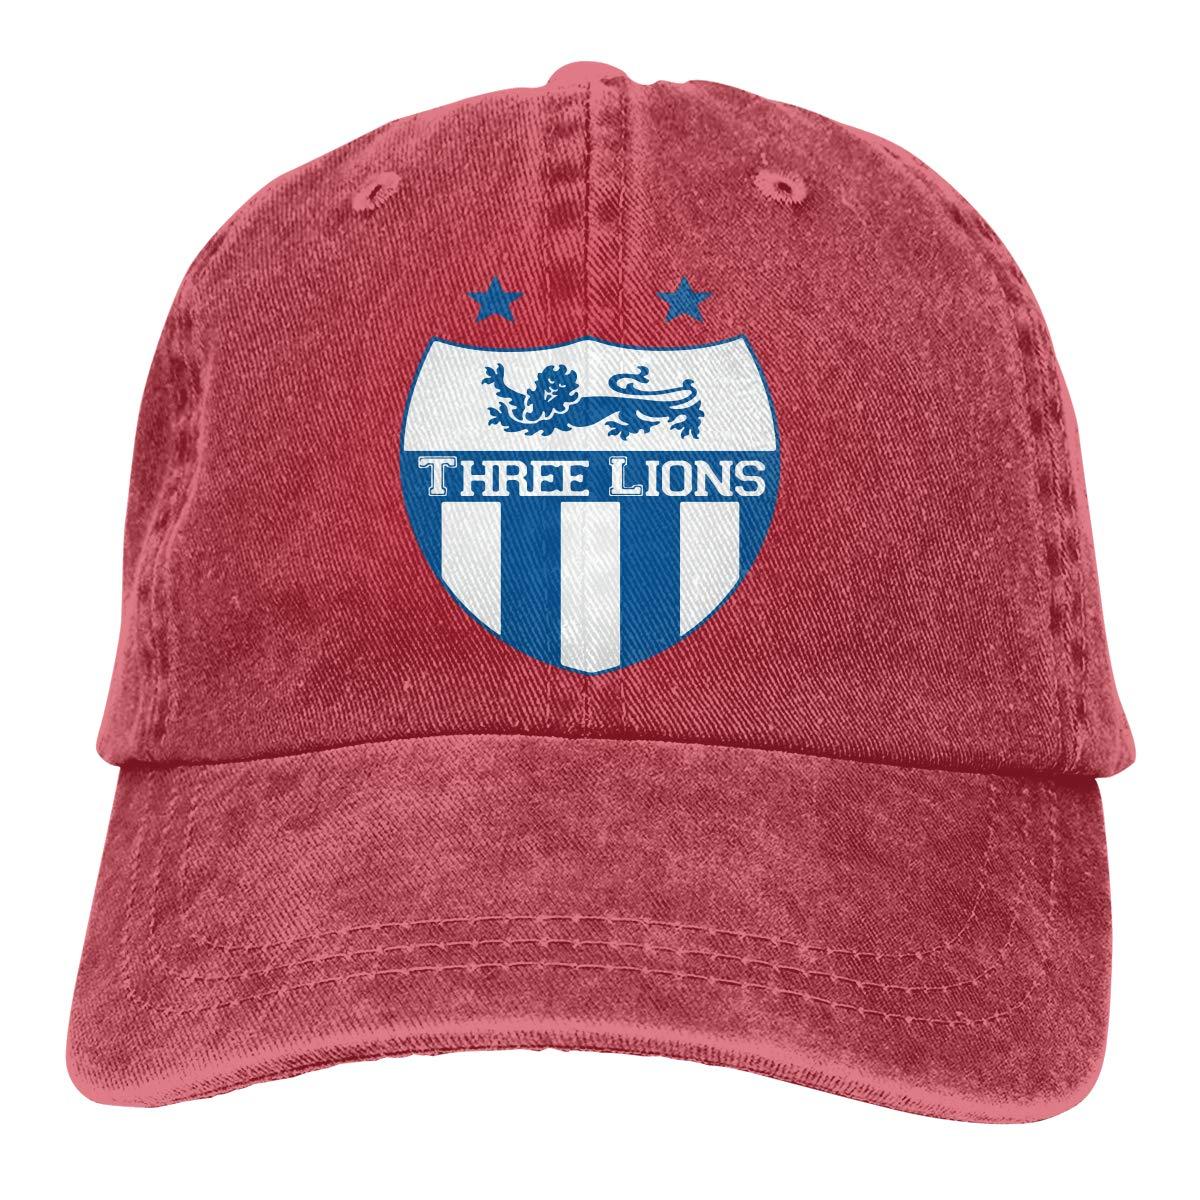 Three Lions Unisex Custom Jeans Outdoor Sports Hat Adjustable Baseball Cap